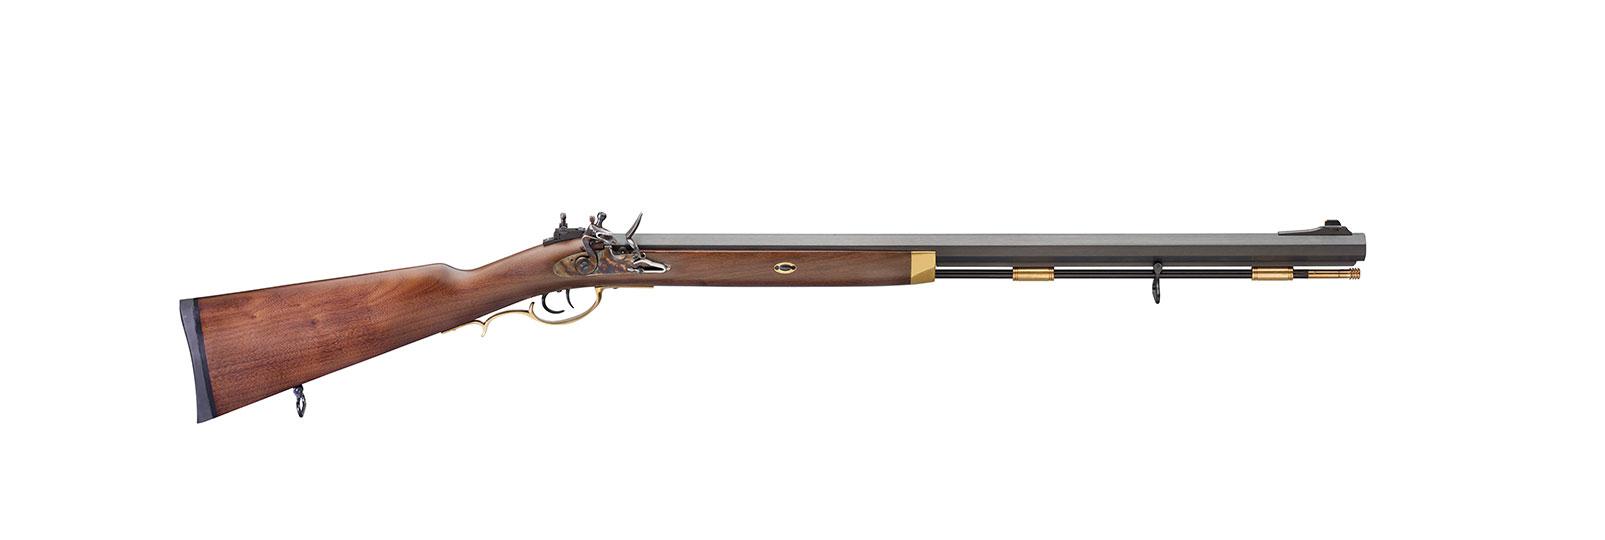 Traditional Hawken Hunter Rifle flintlock model